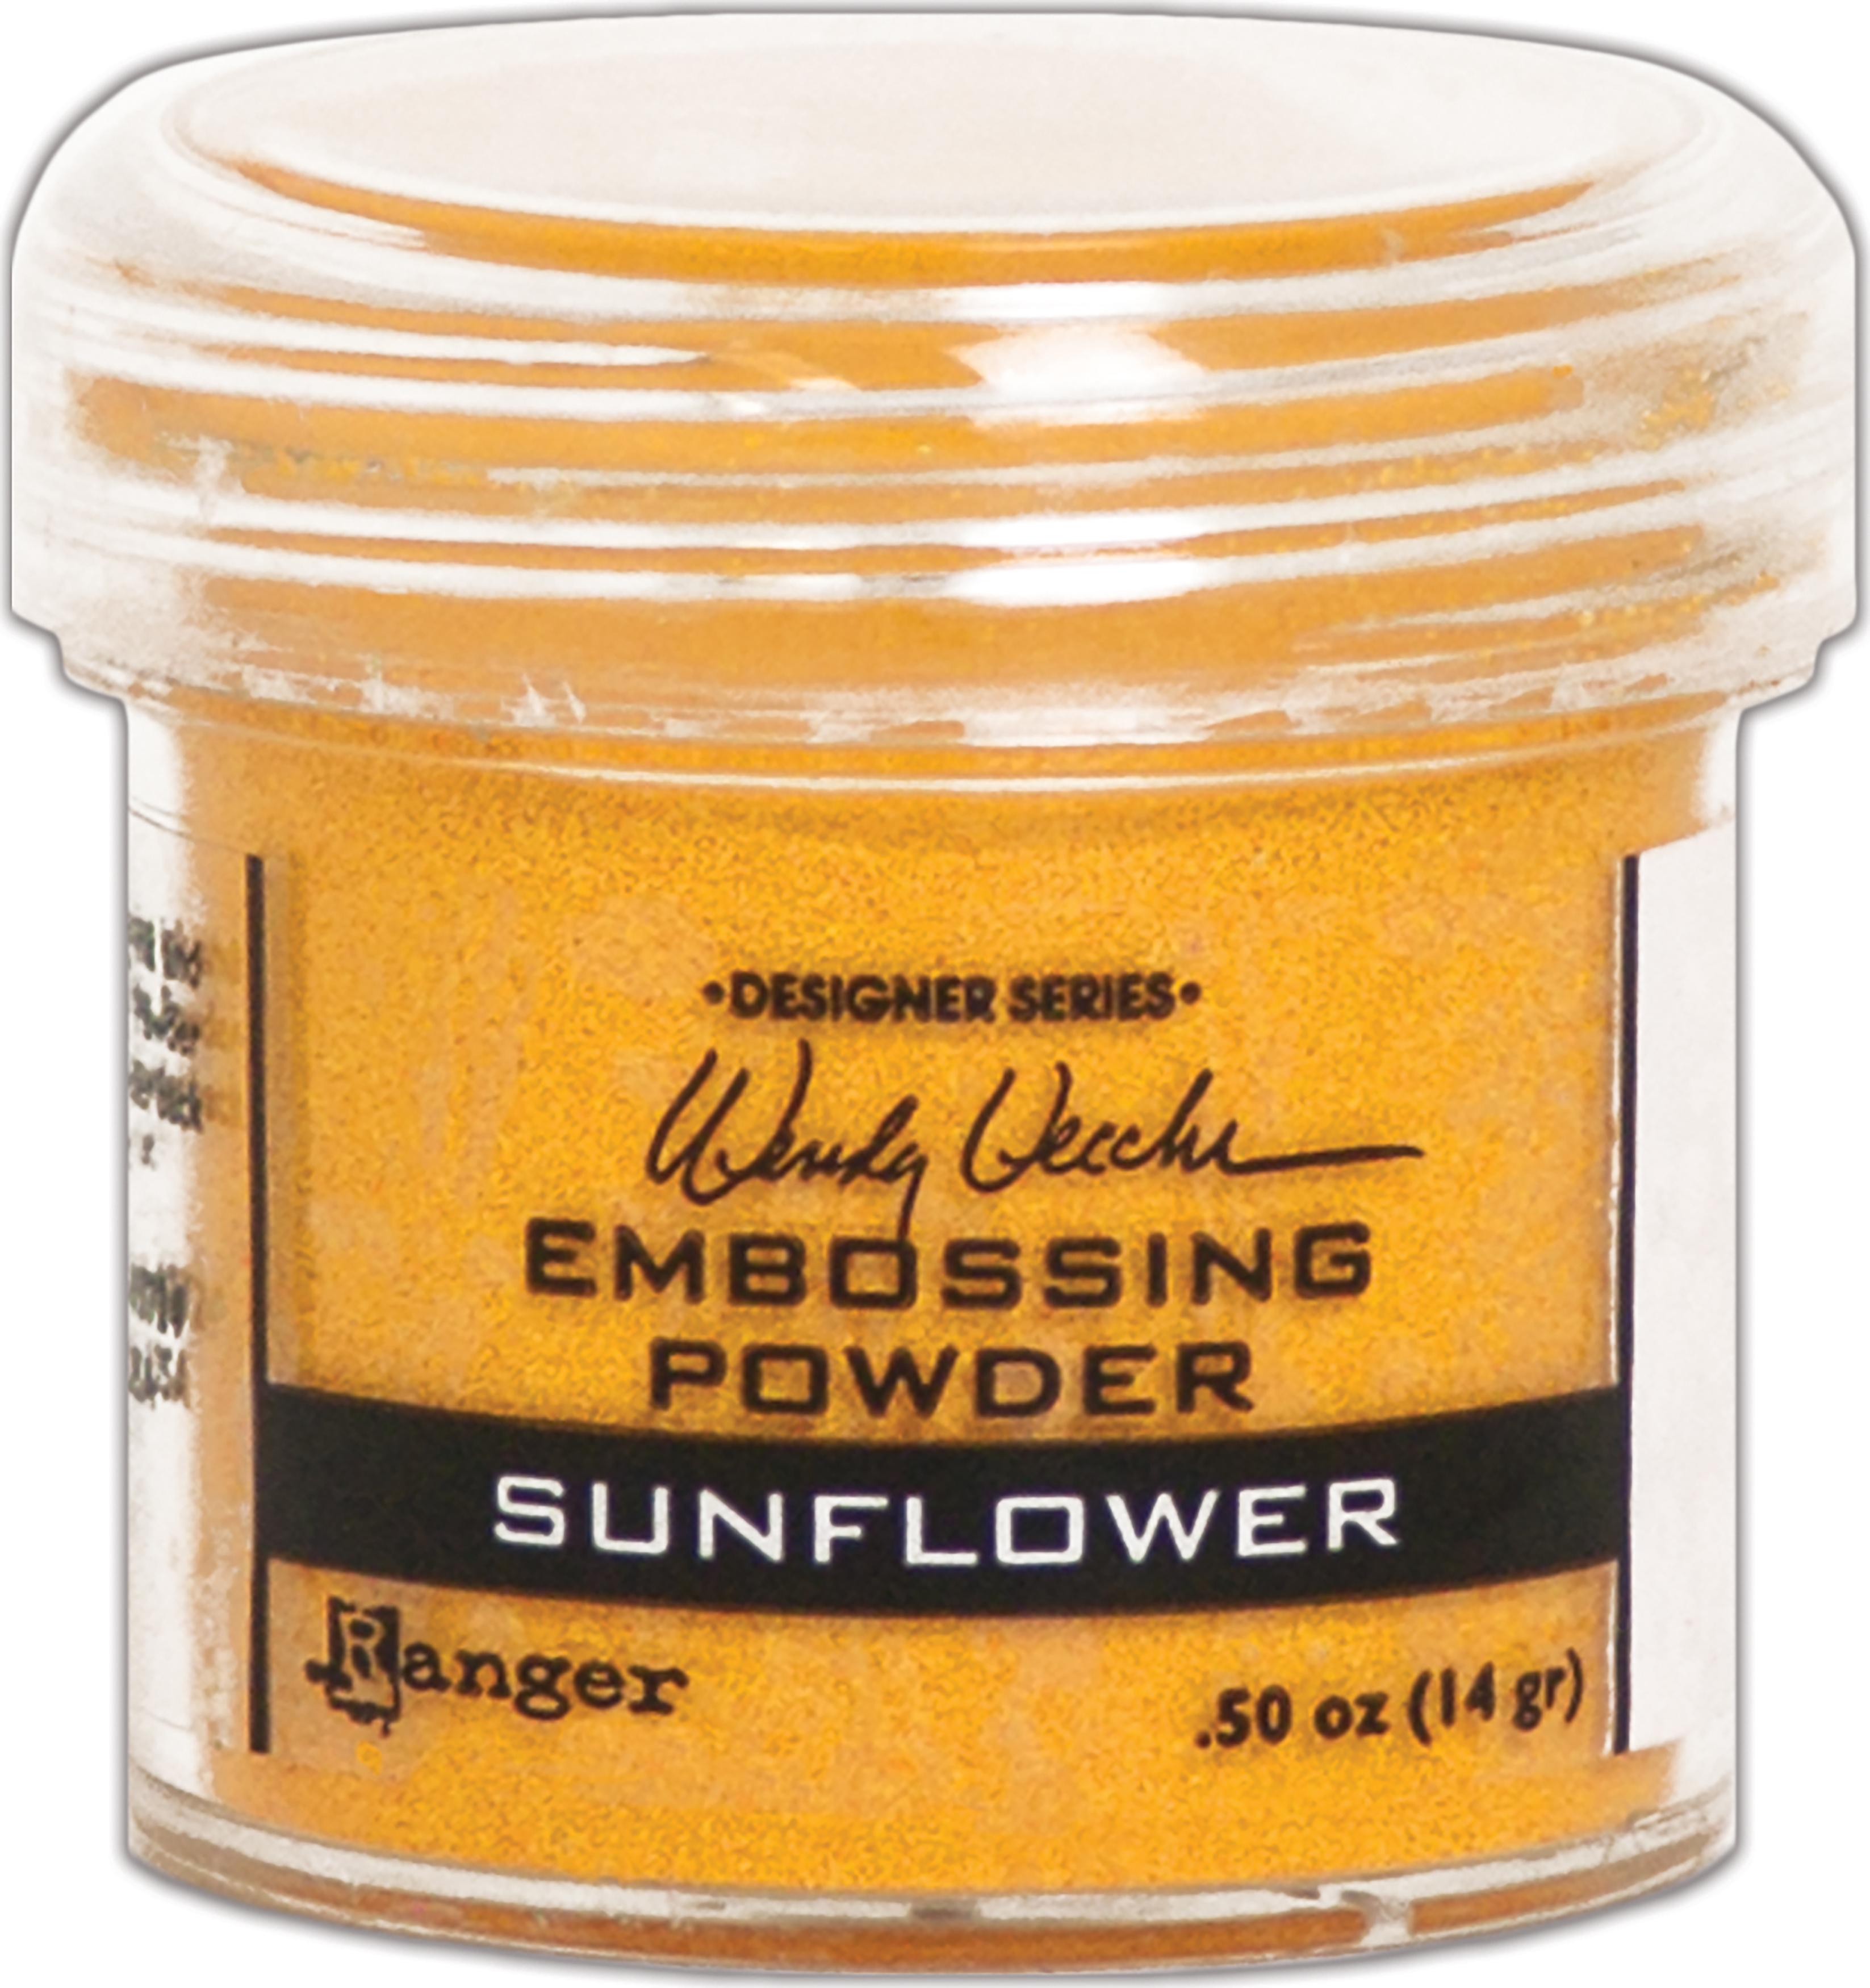 Wendy Vecchi Embossing Powder -Sunflower